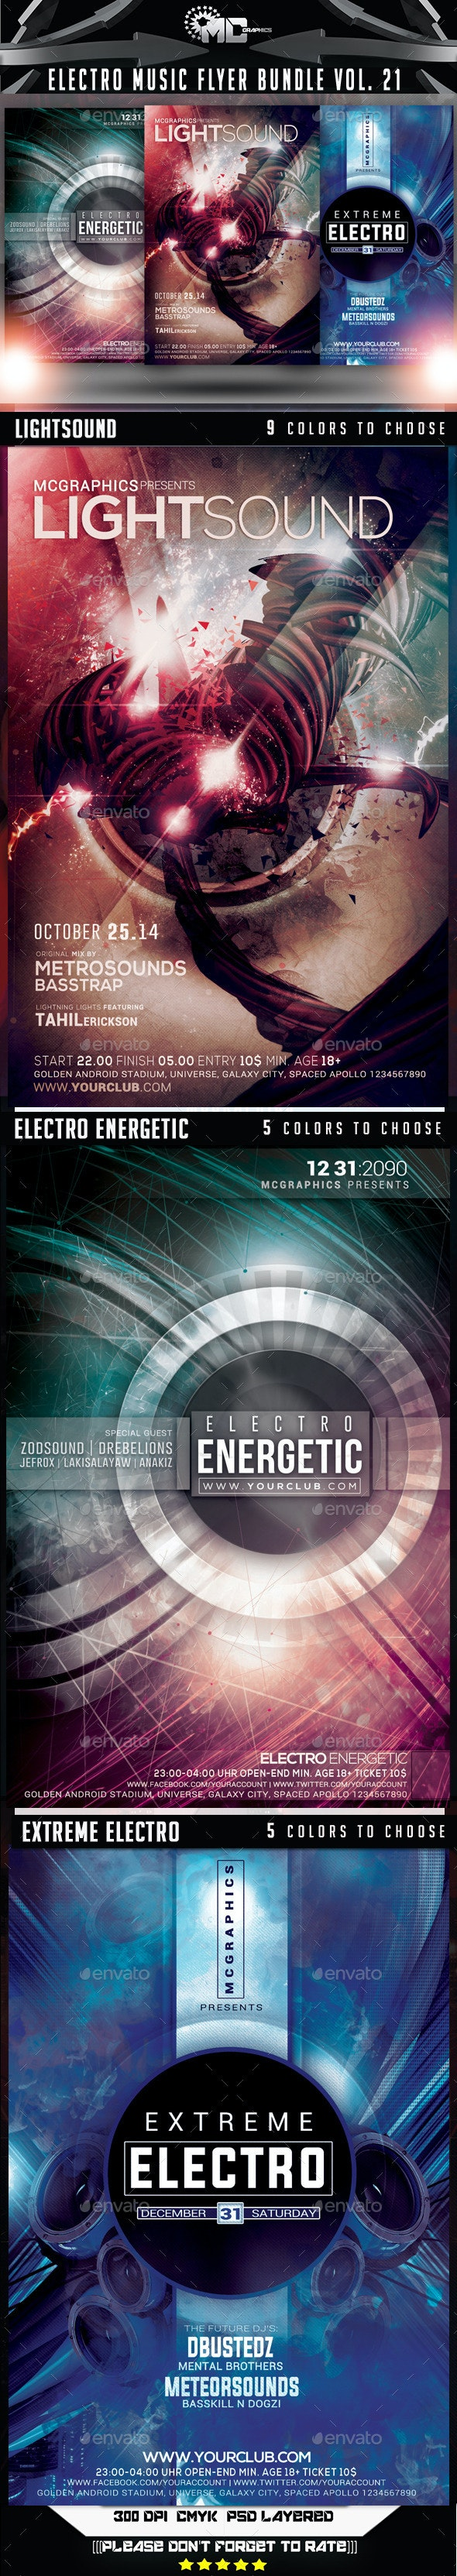 Electro Music Flyer Bundle Vol. 21 - Events Flyers